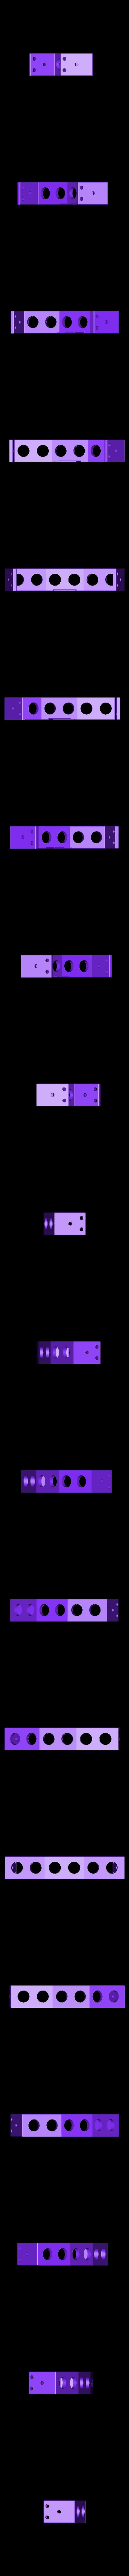 montura_para_tres_pic_a_15_grados_con_terminales_en_90_grados.STL Download free STL file Mounting for 3 HC SR04 15° sensors with 90° terminals • 3D printer design, memoretirado